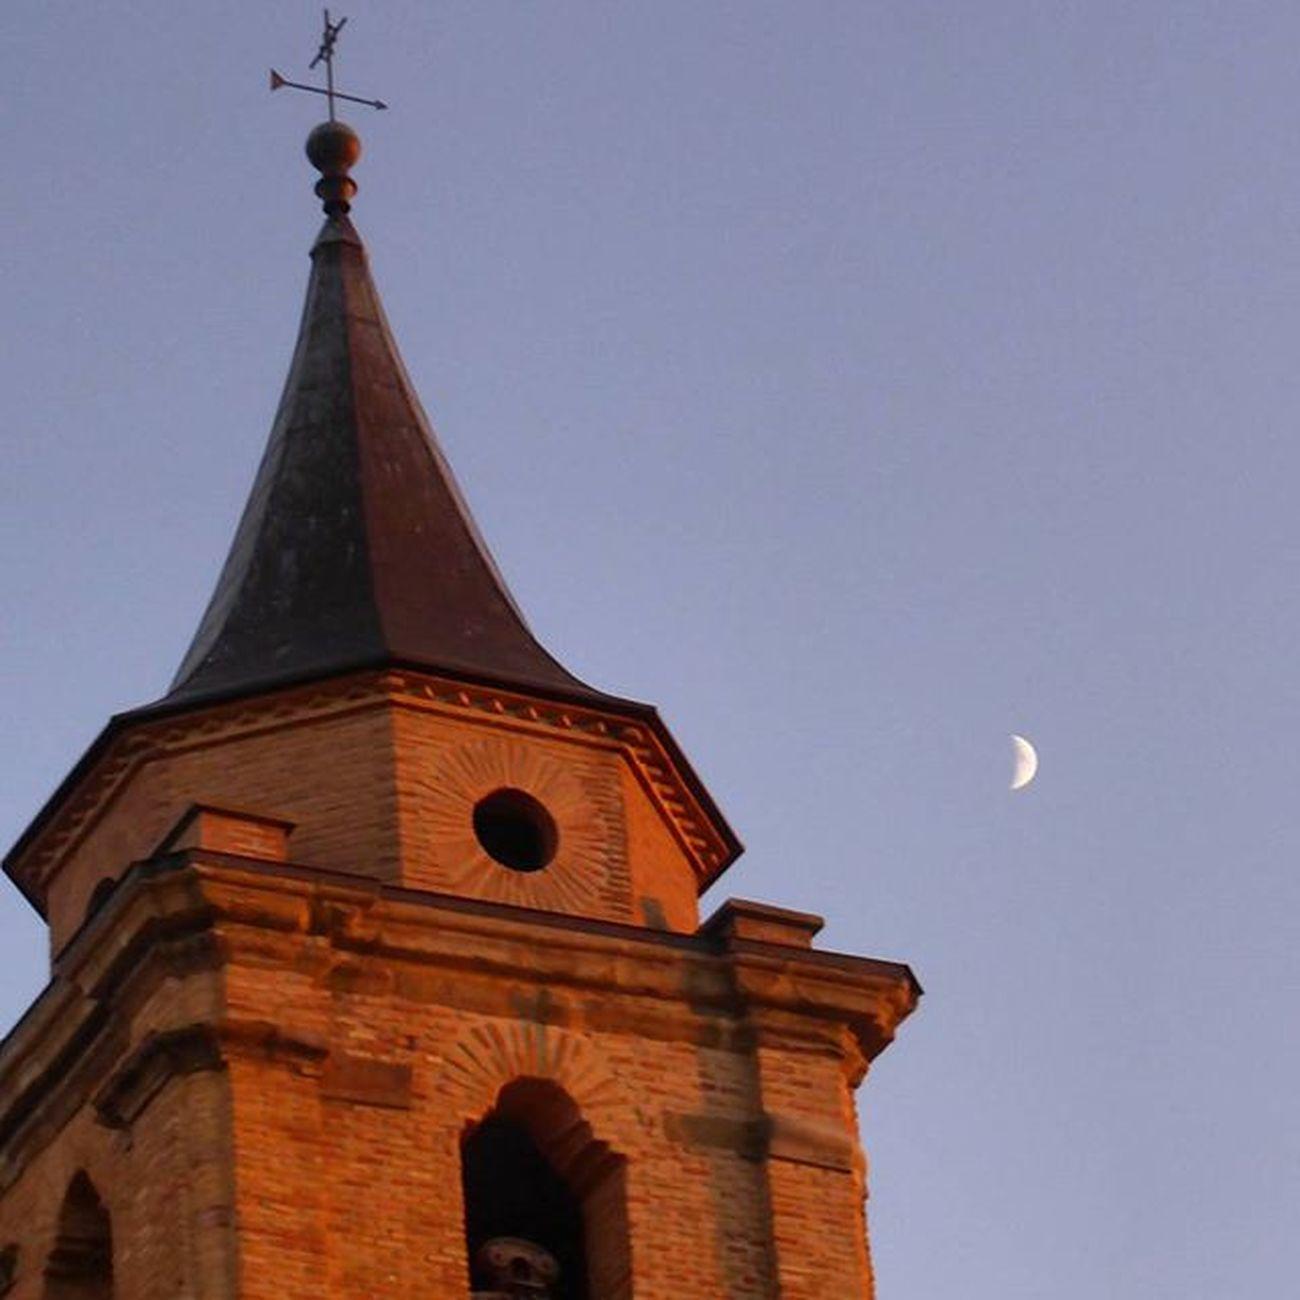 Esa Luna. Skylovers LasPedrosas Moon Lunalunera instazgz igerszgz igersaragon YovisitoCincoVillas